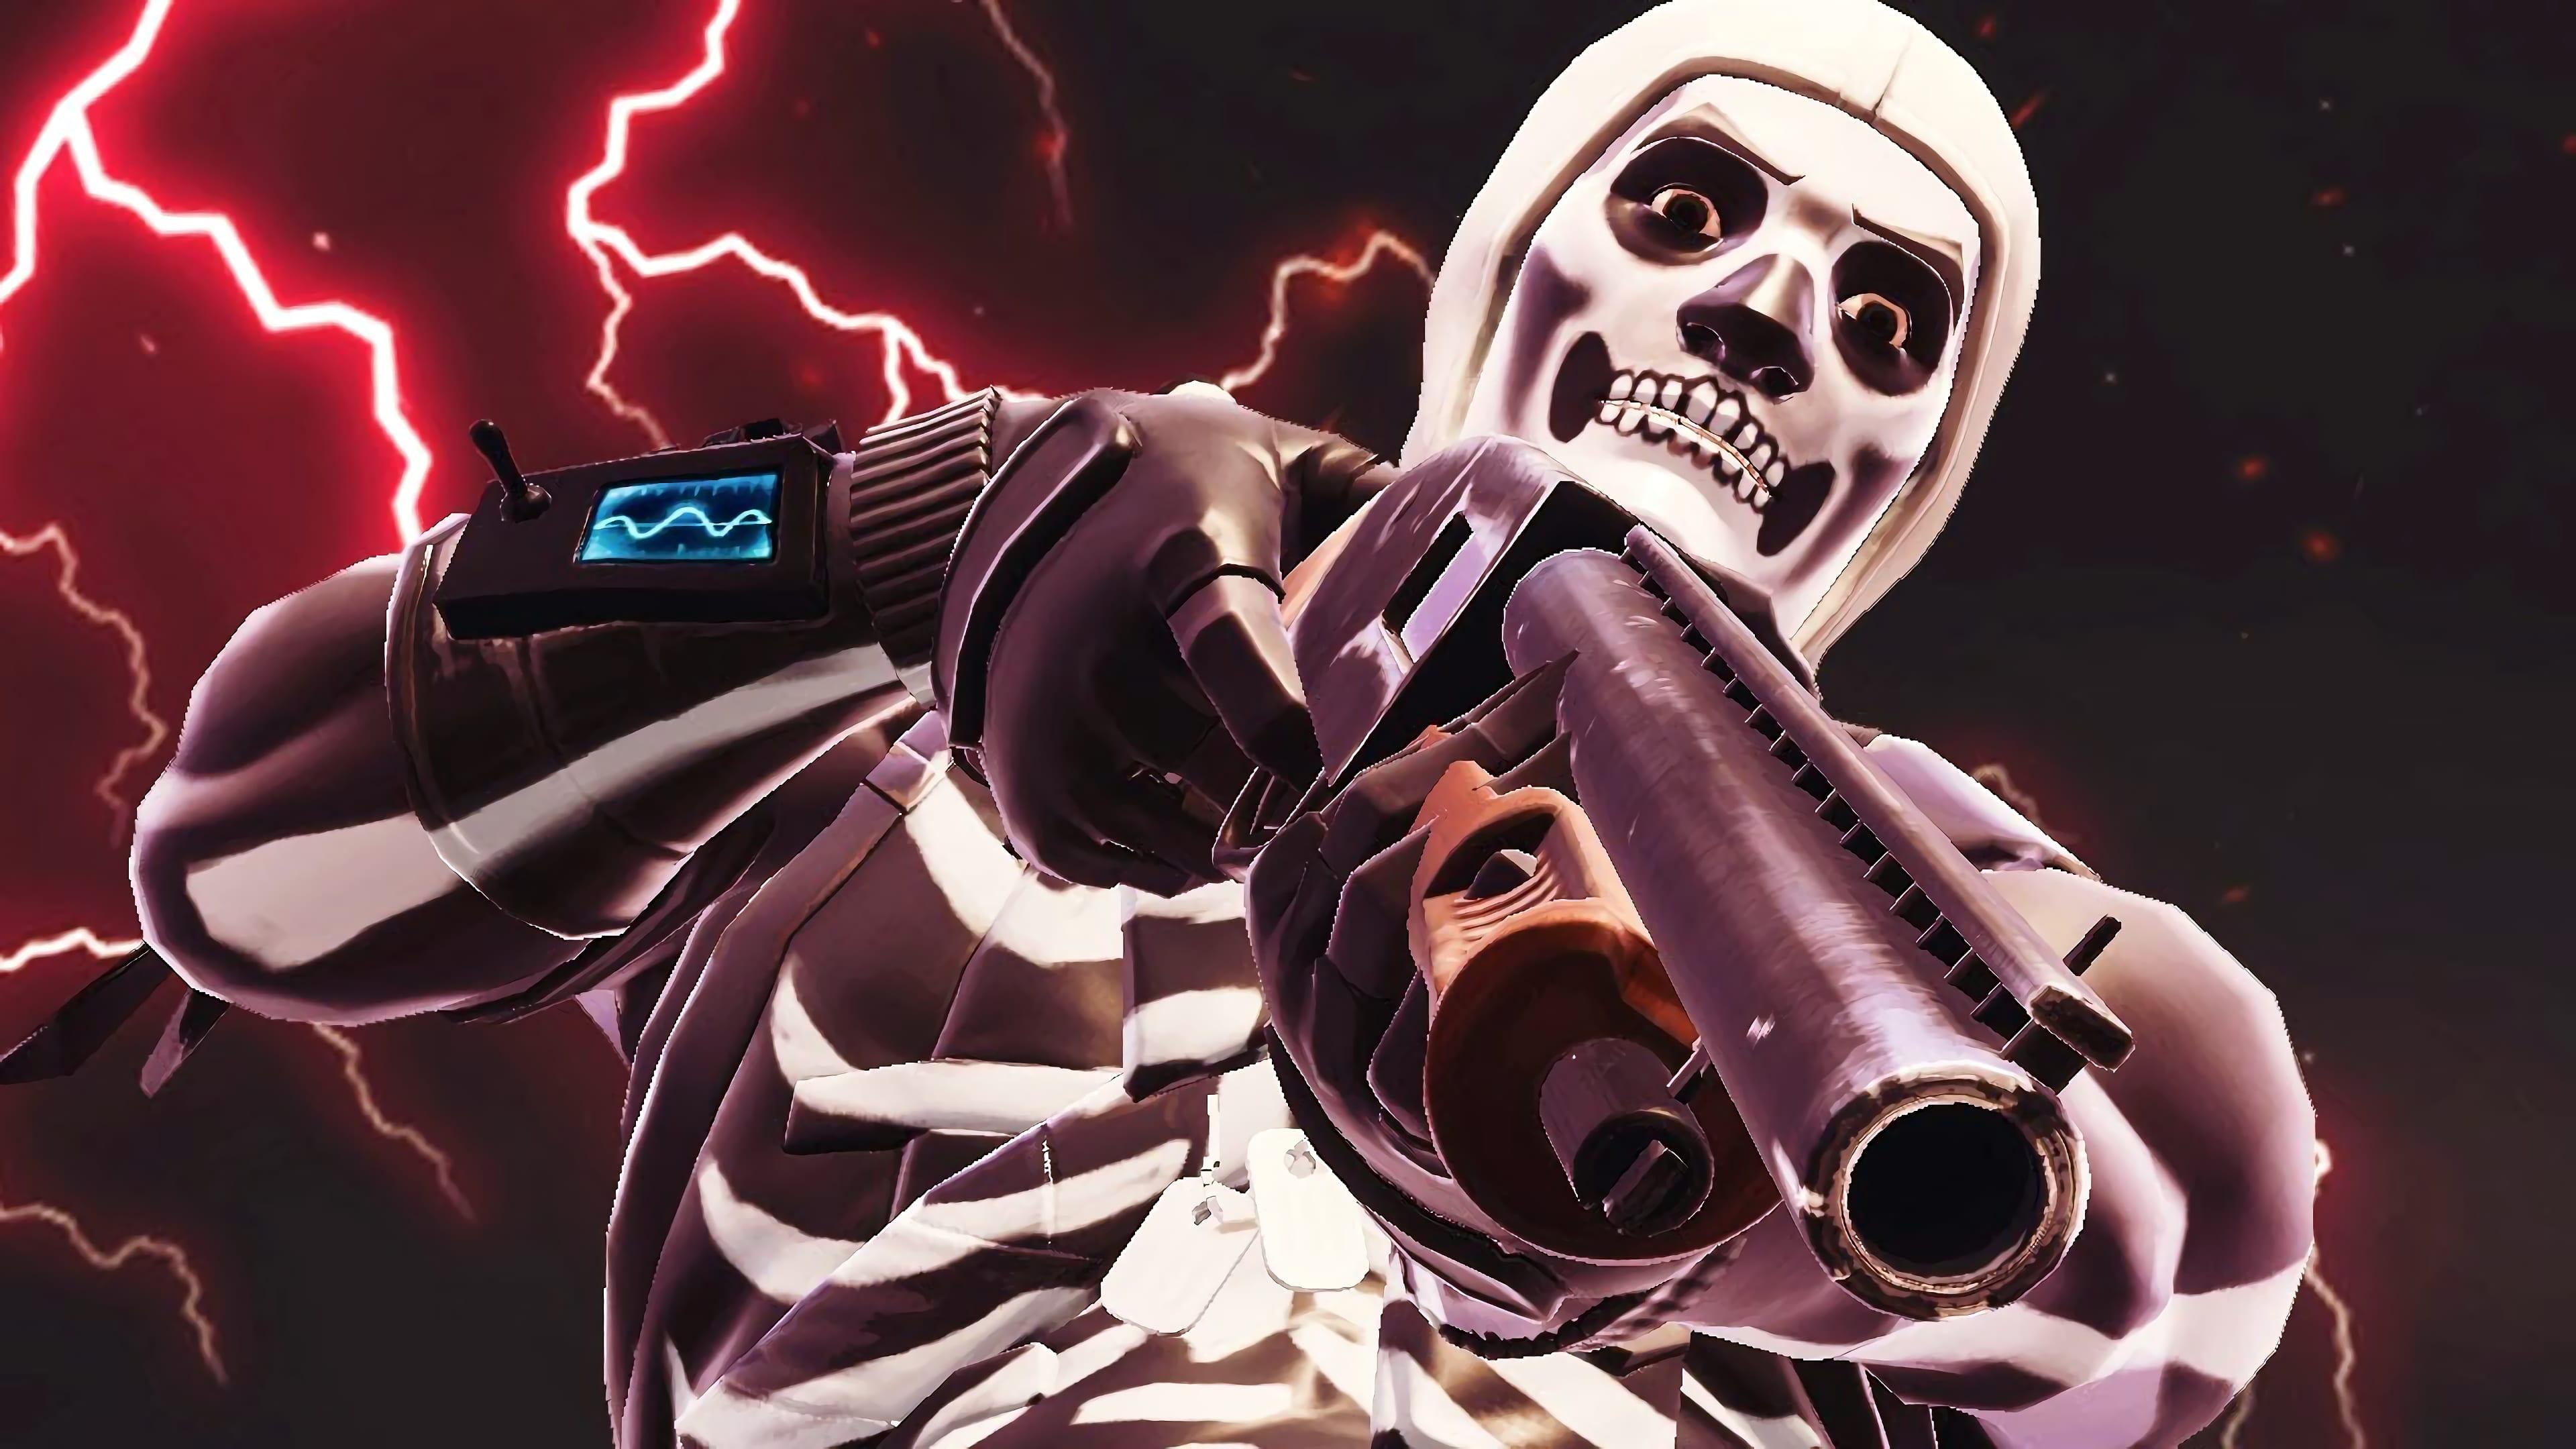 Fortnite Battle Royale Skull Trooper 4072 Wallpapers and 3840x2160